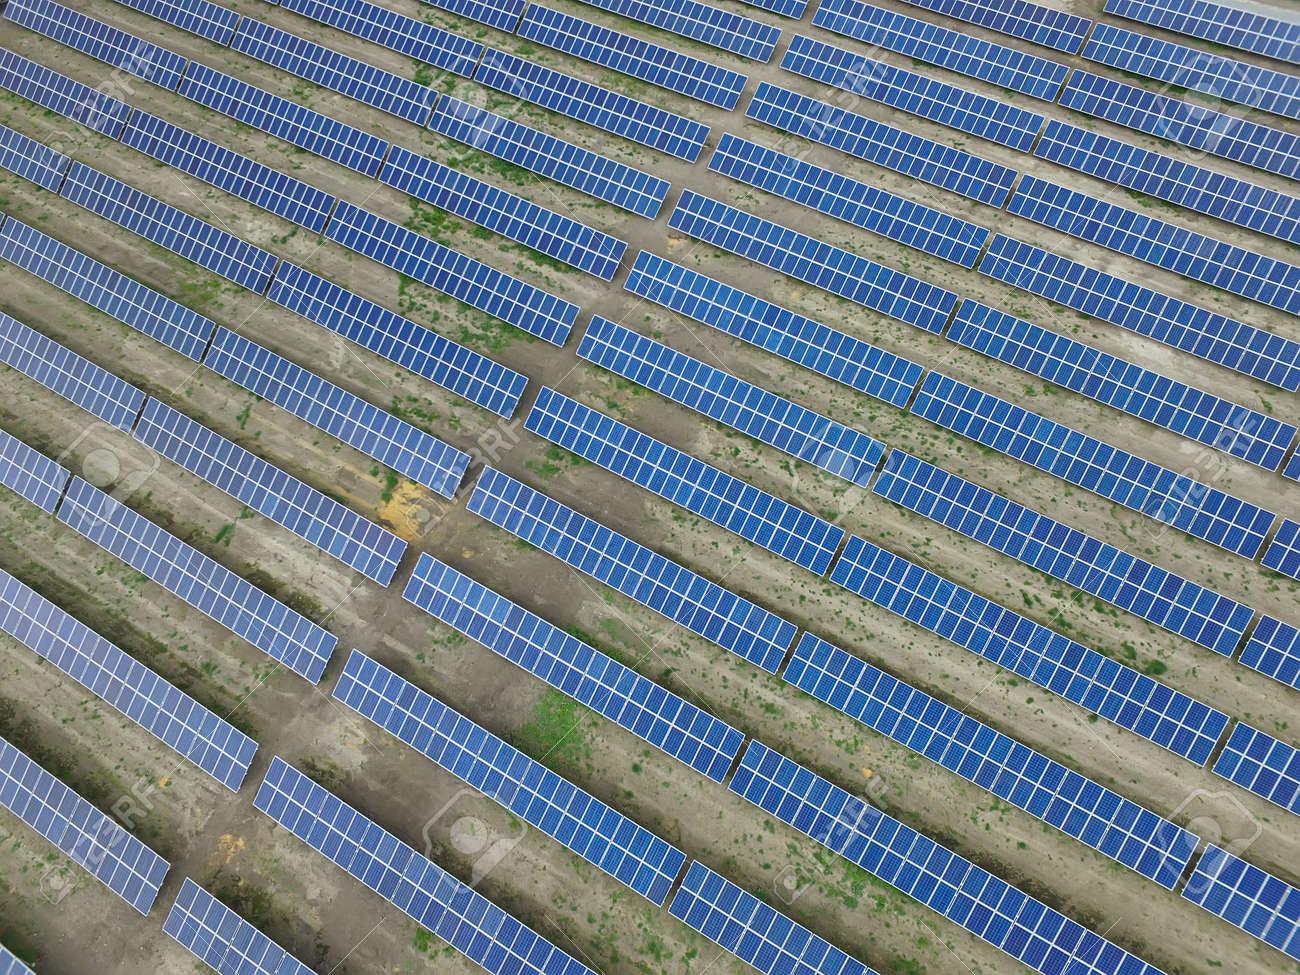 Renewable sun energy, industrial landscape - 126328997